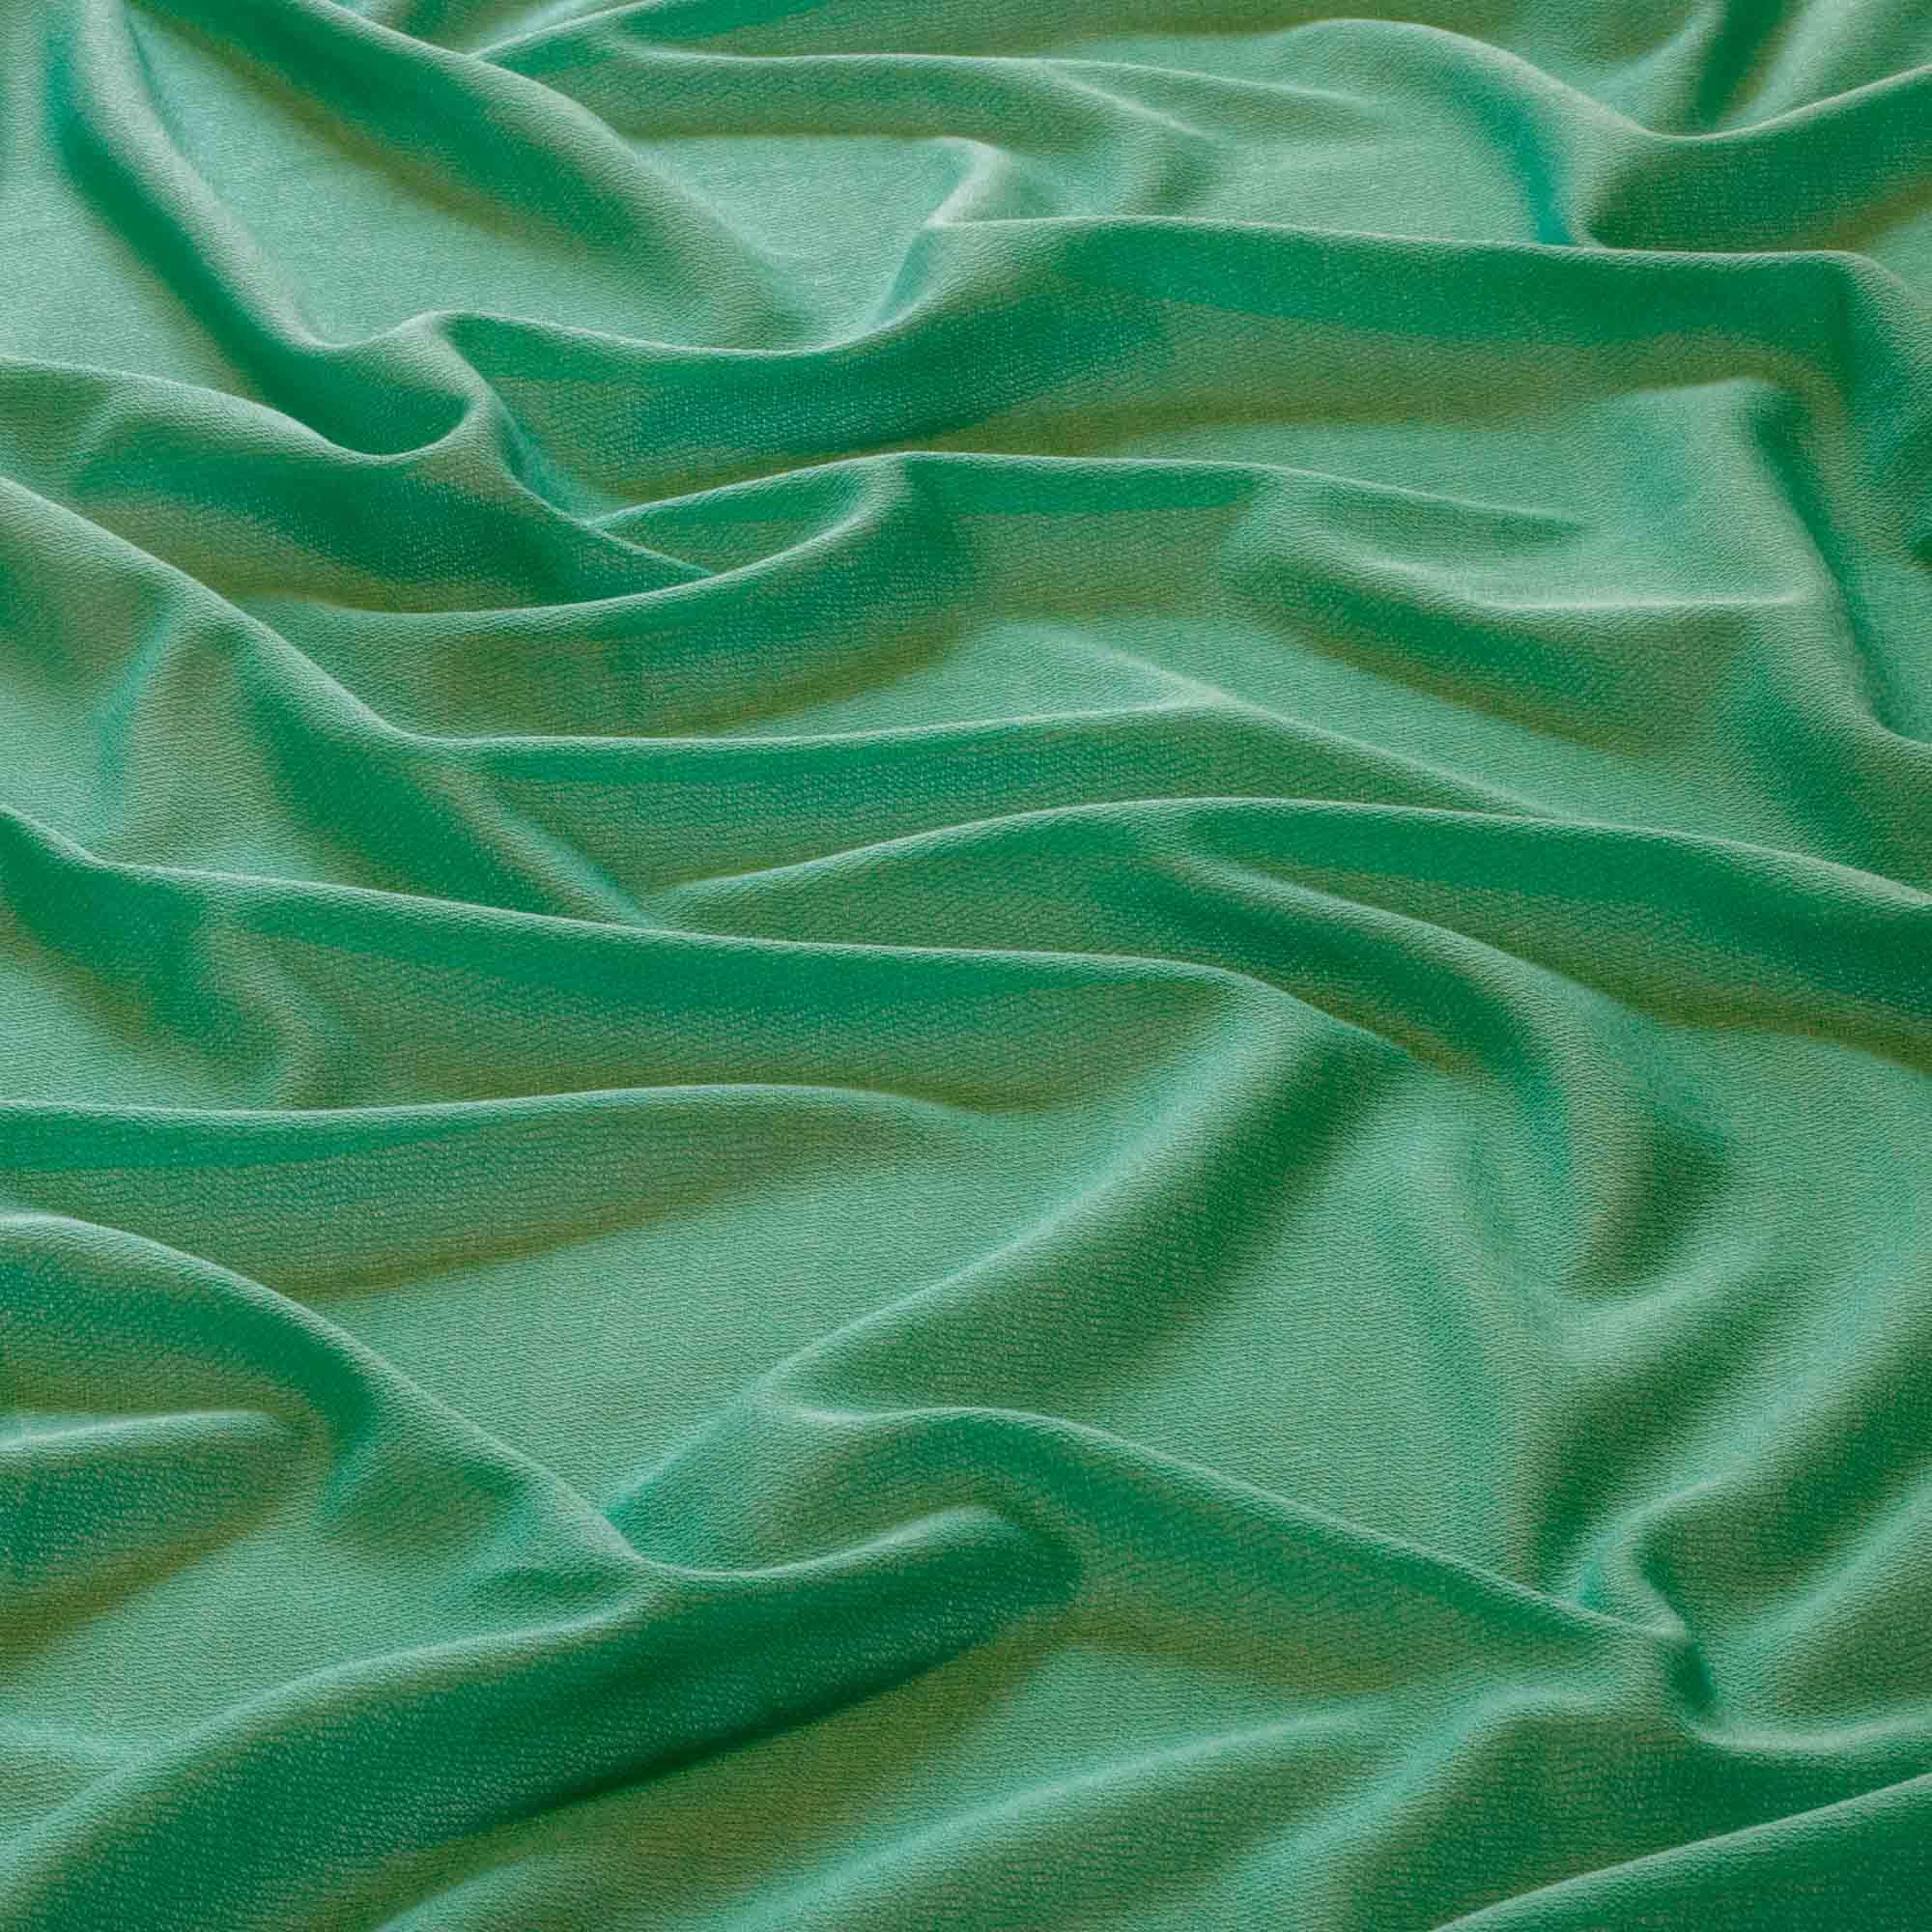 Tecido Malha para Forro Verde 1,80 m Largura